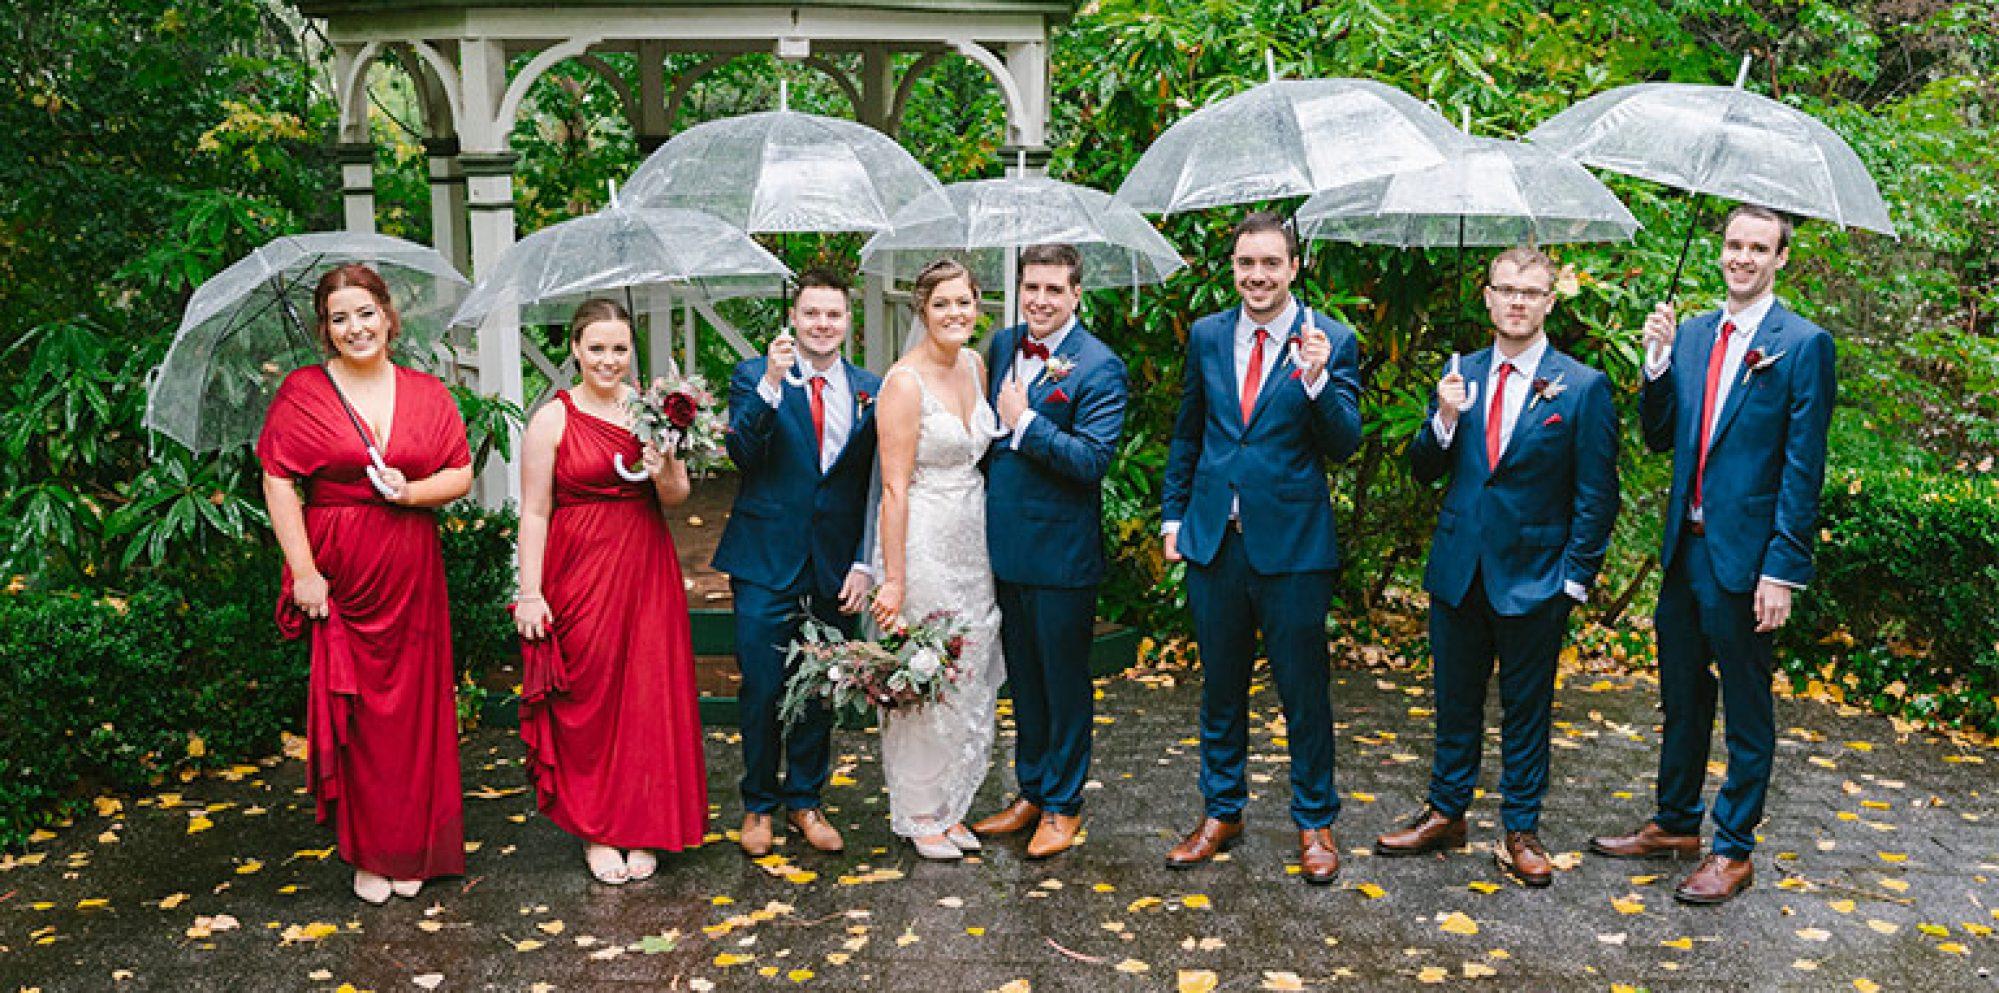 Sam & emily wedding photography @ chateau wyuna